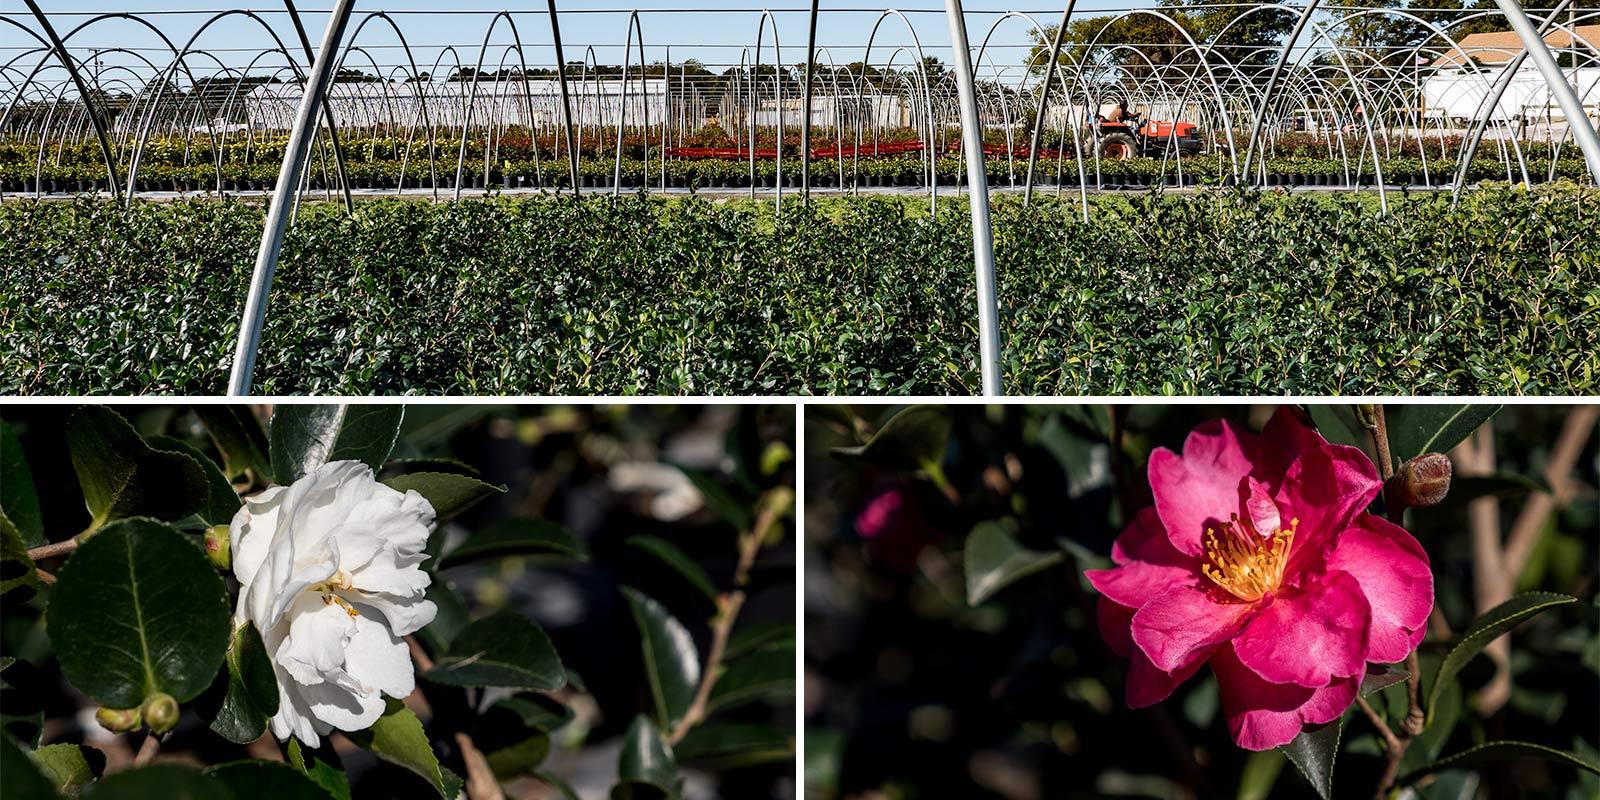 camellia_spread.jpg